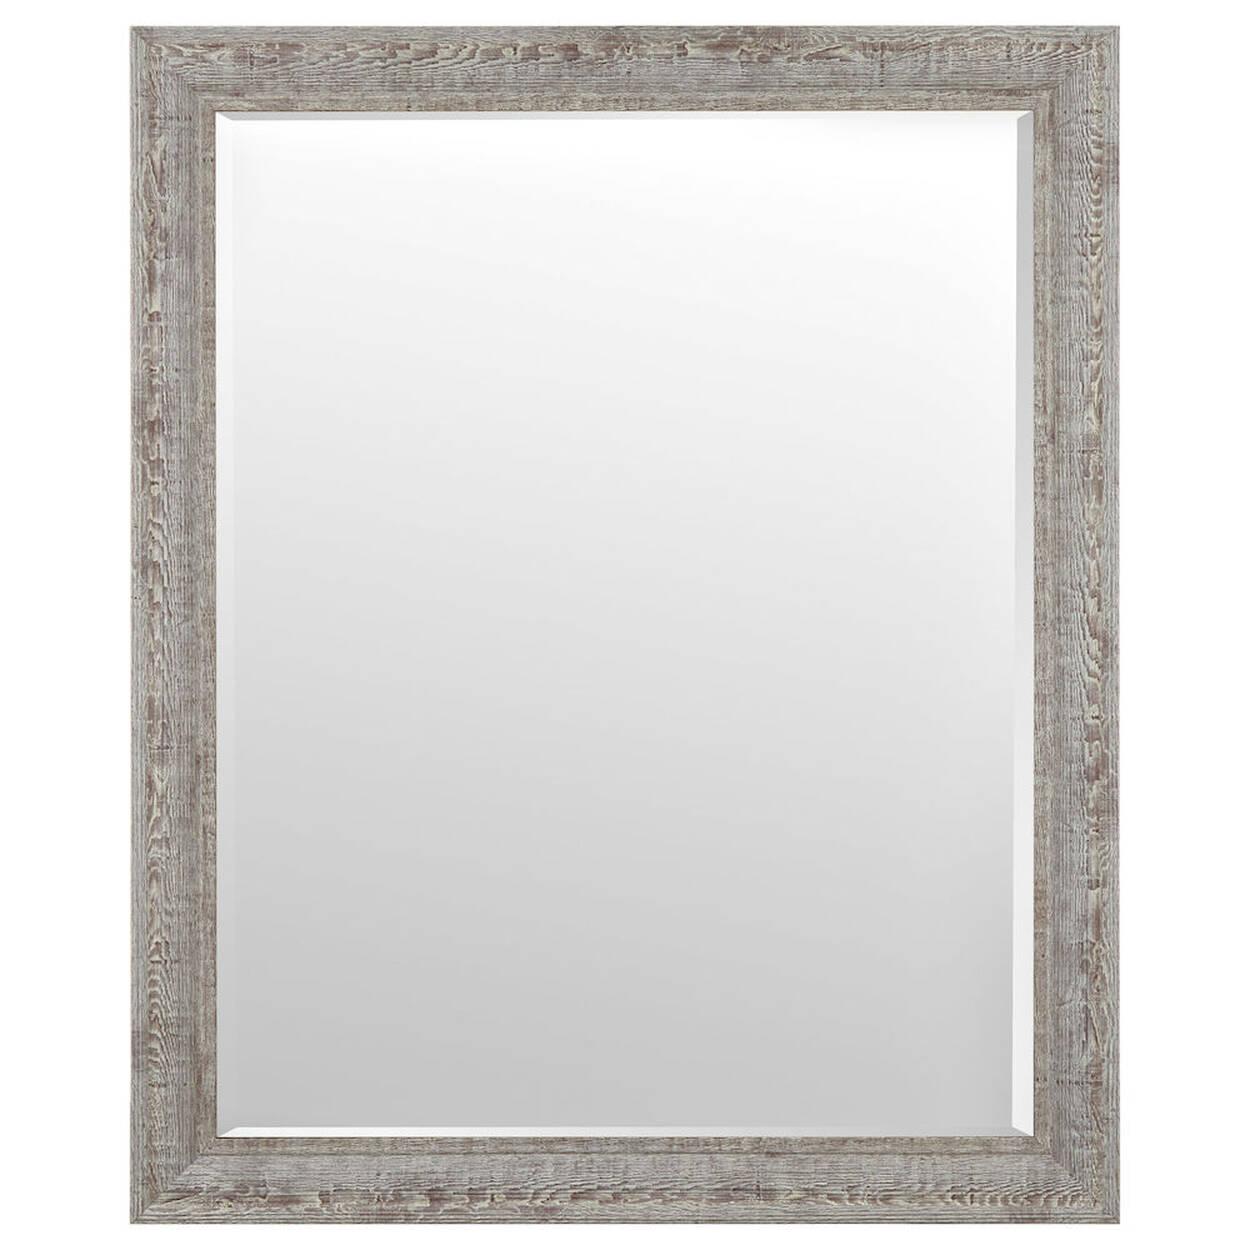 Unique Whitewashed Frame Mirror | Bouclair.com KT33